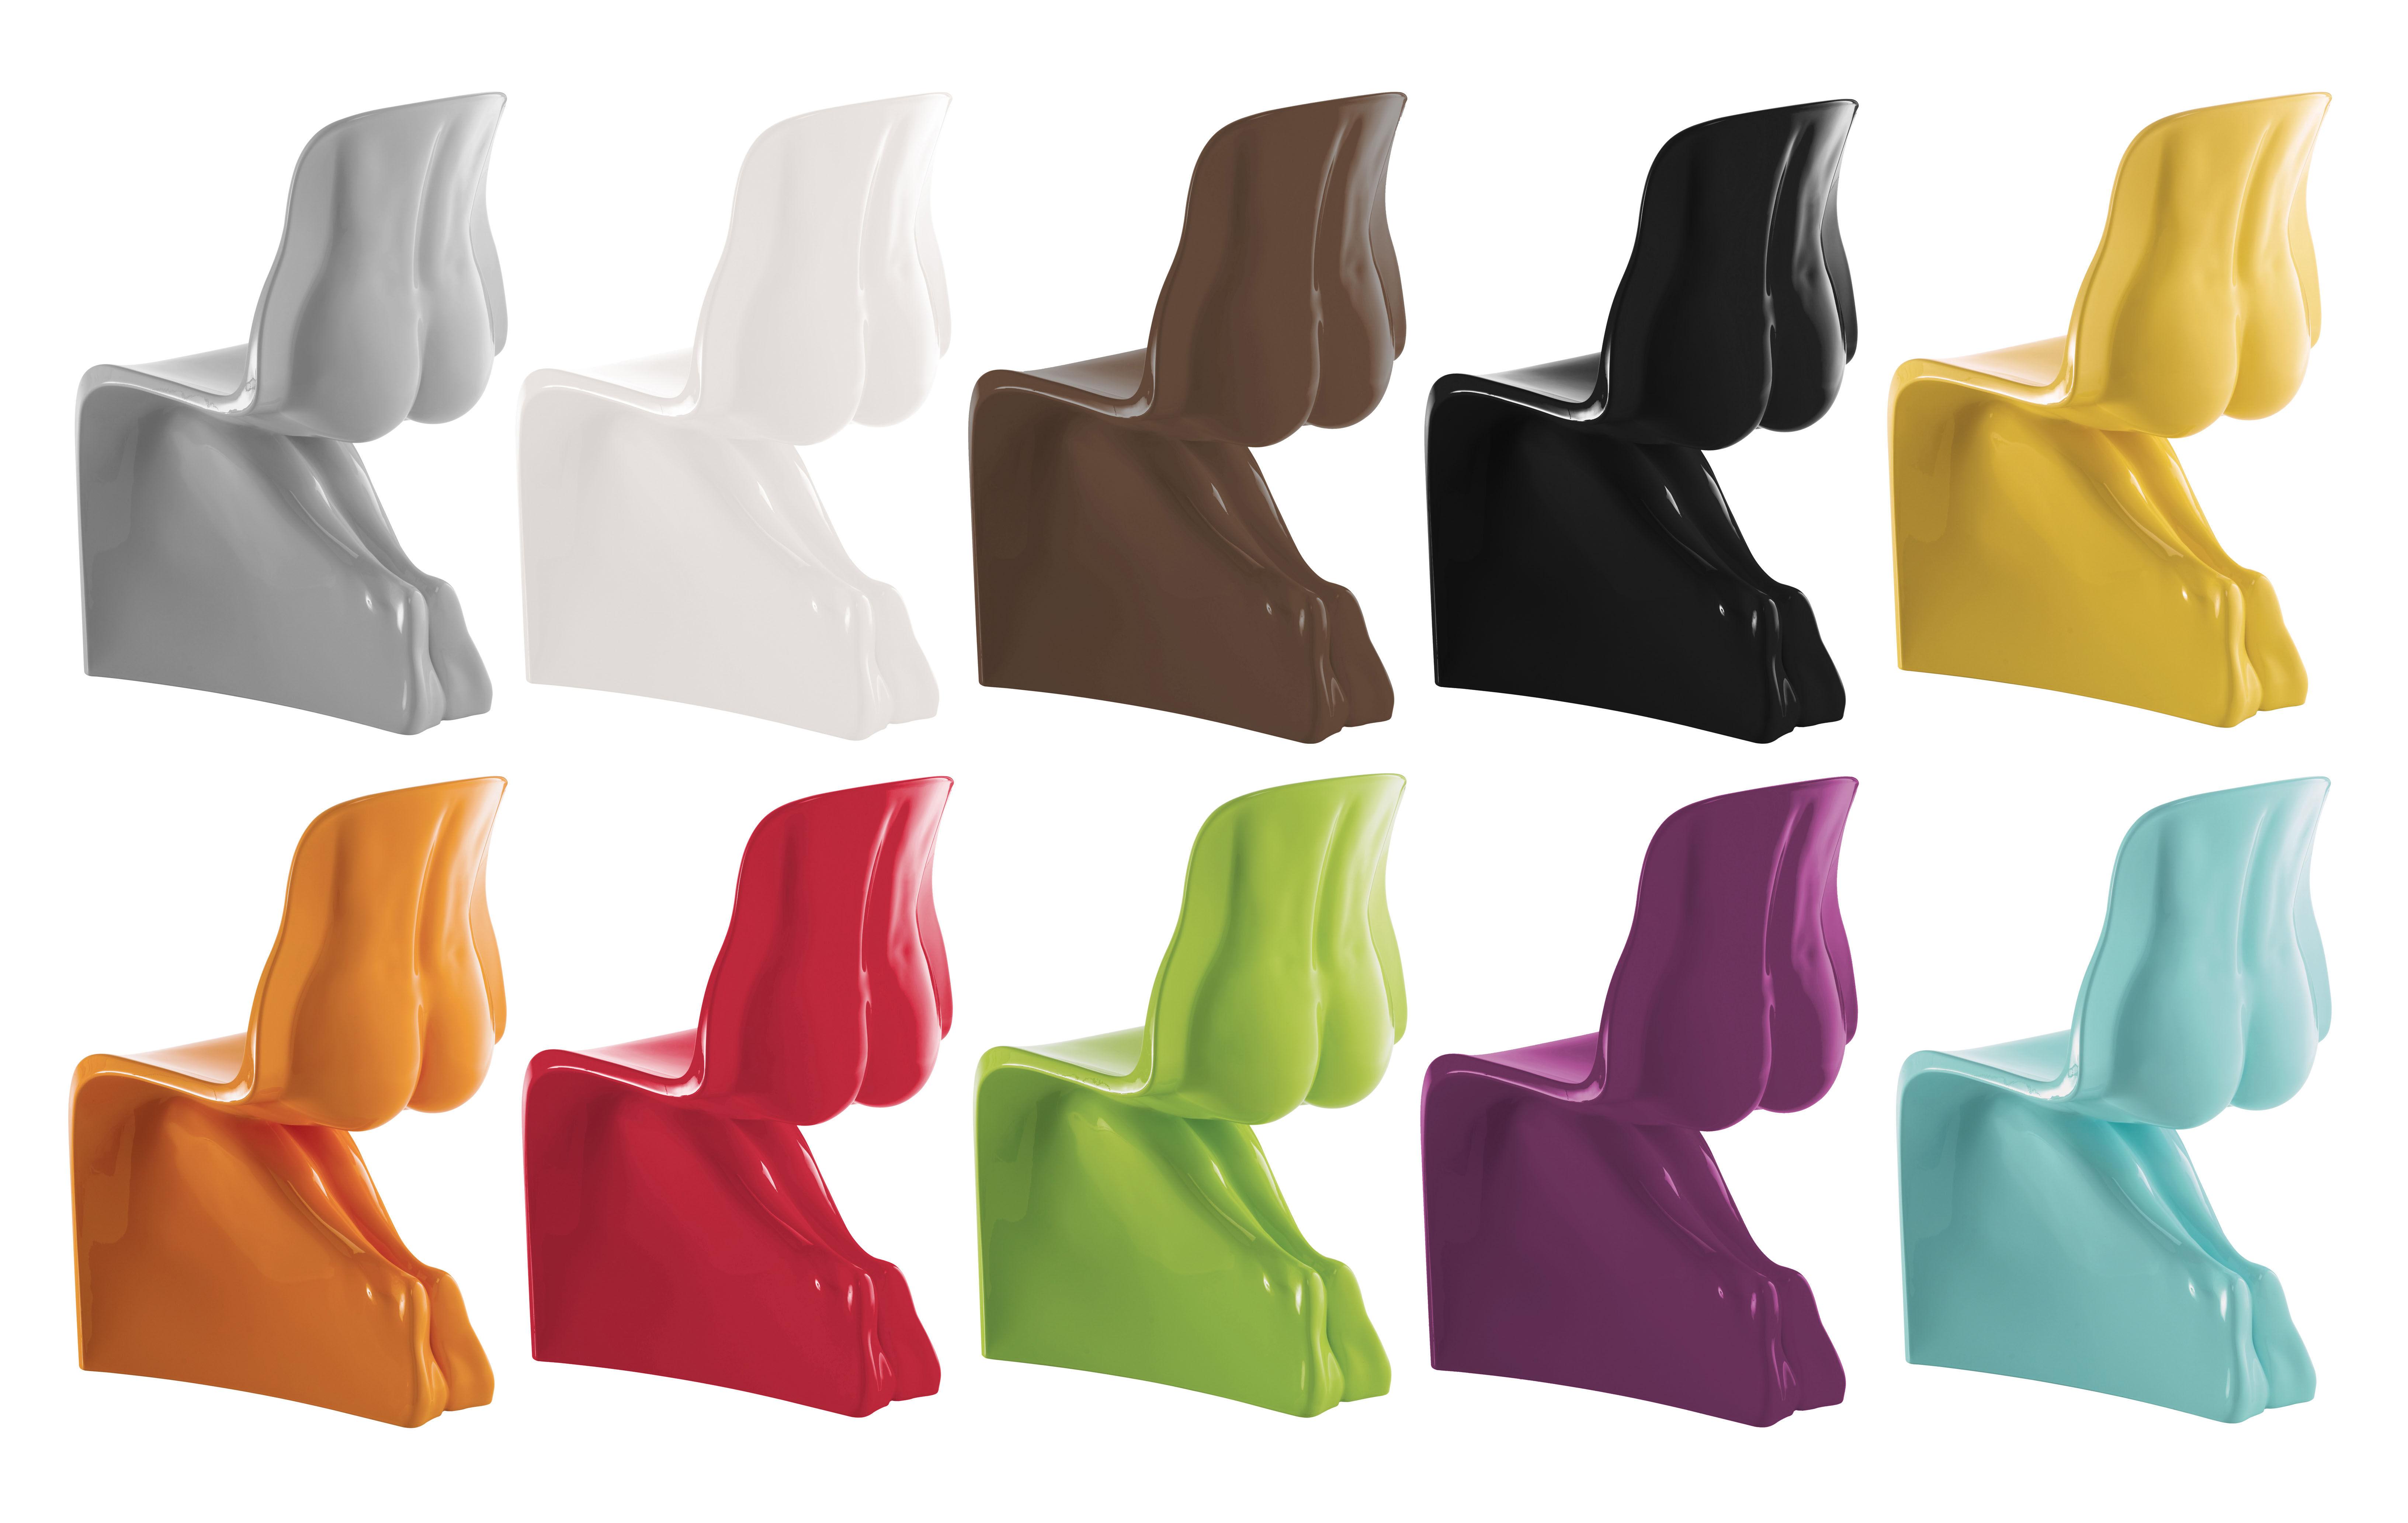 f923952f7ce Chaise Her laquée  Plastique Vert clair - Casamania